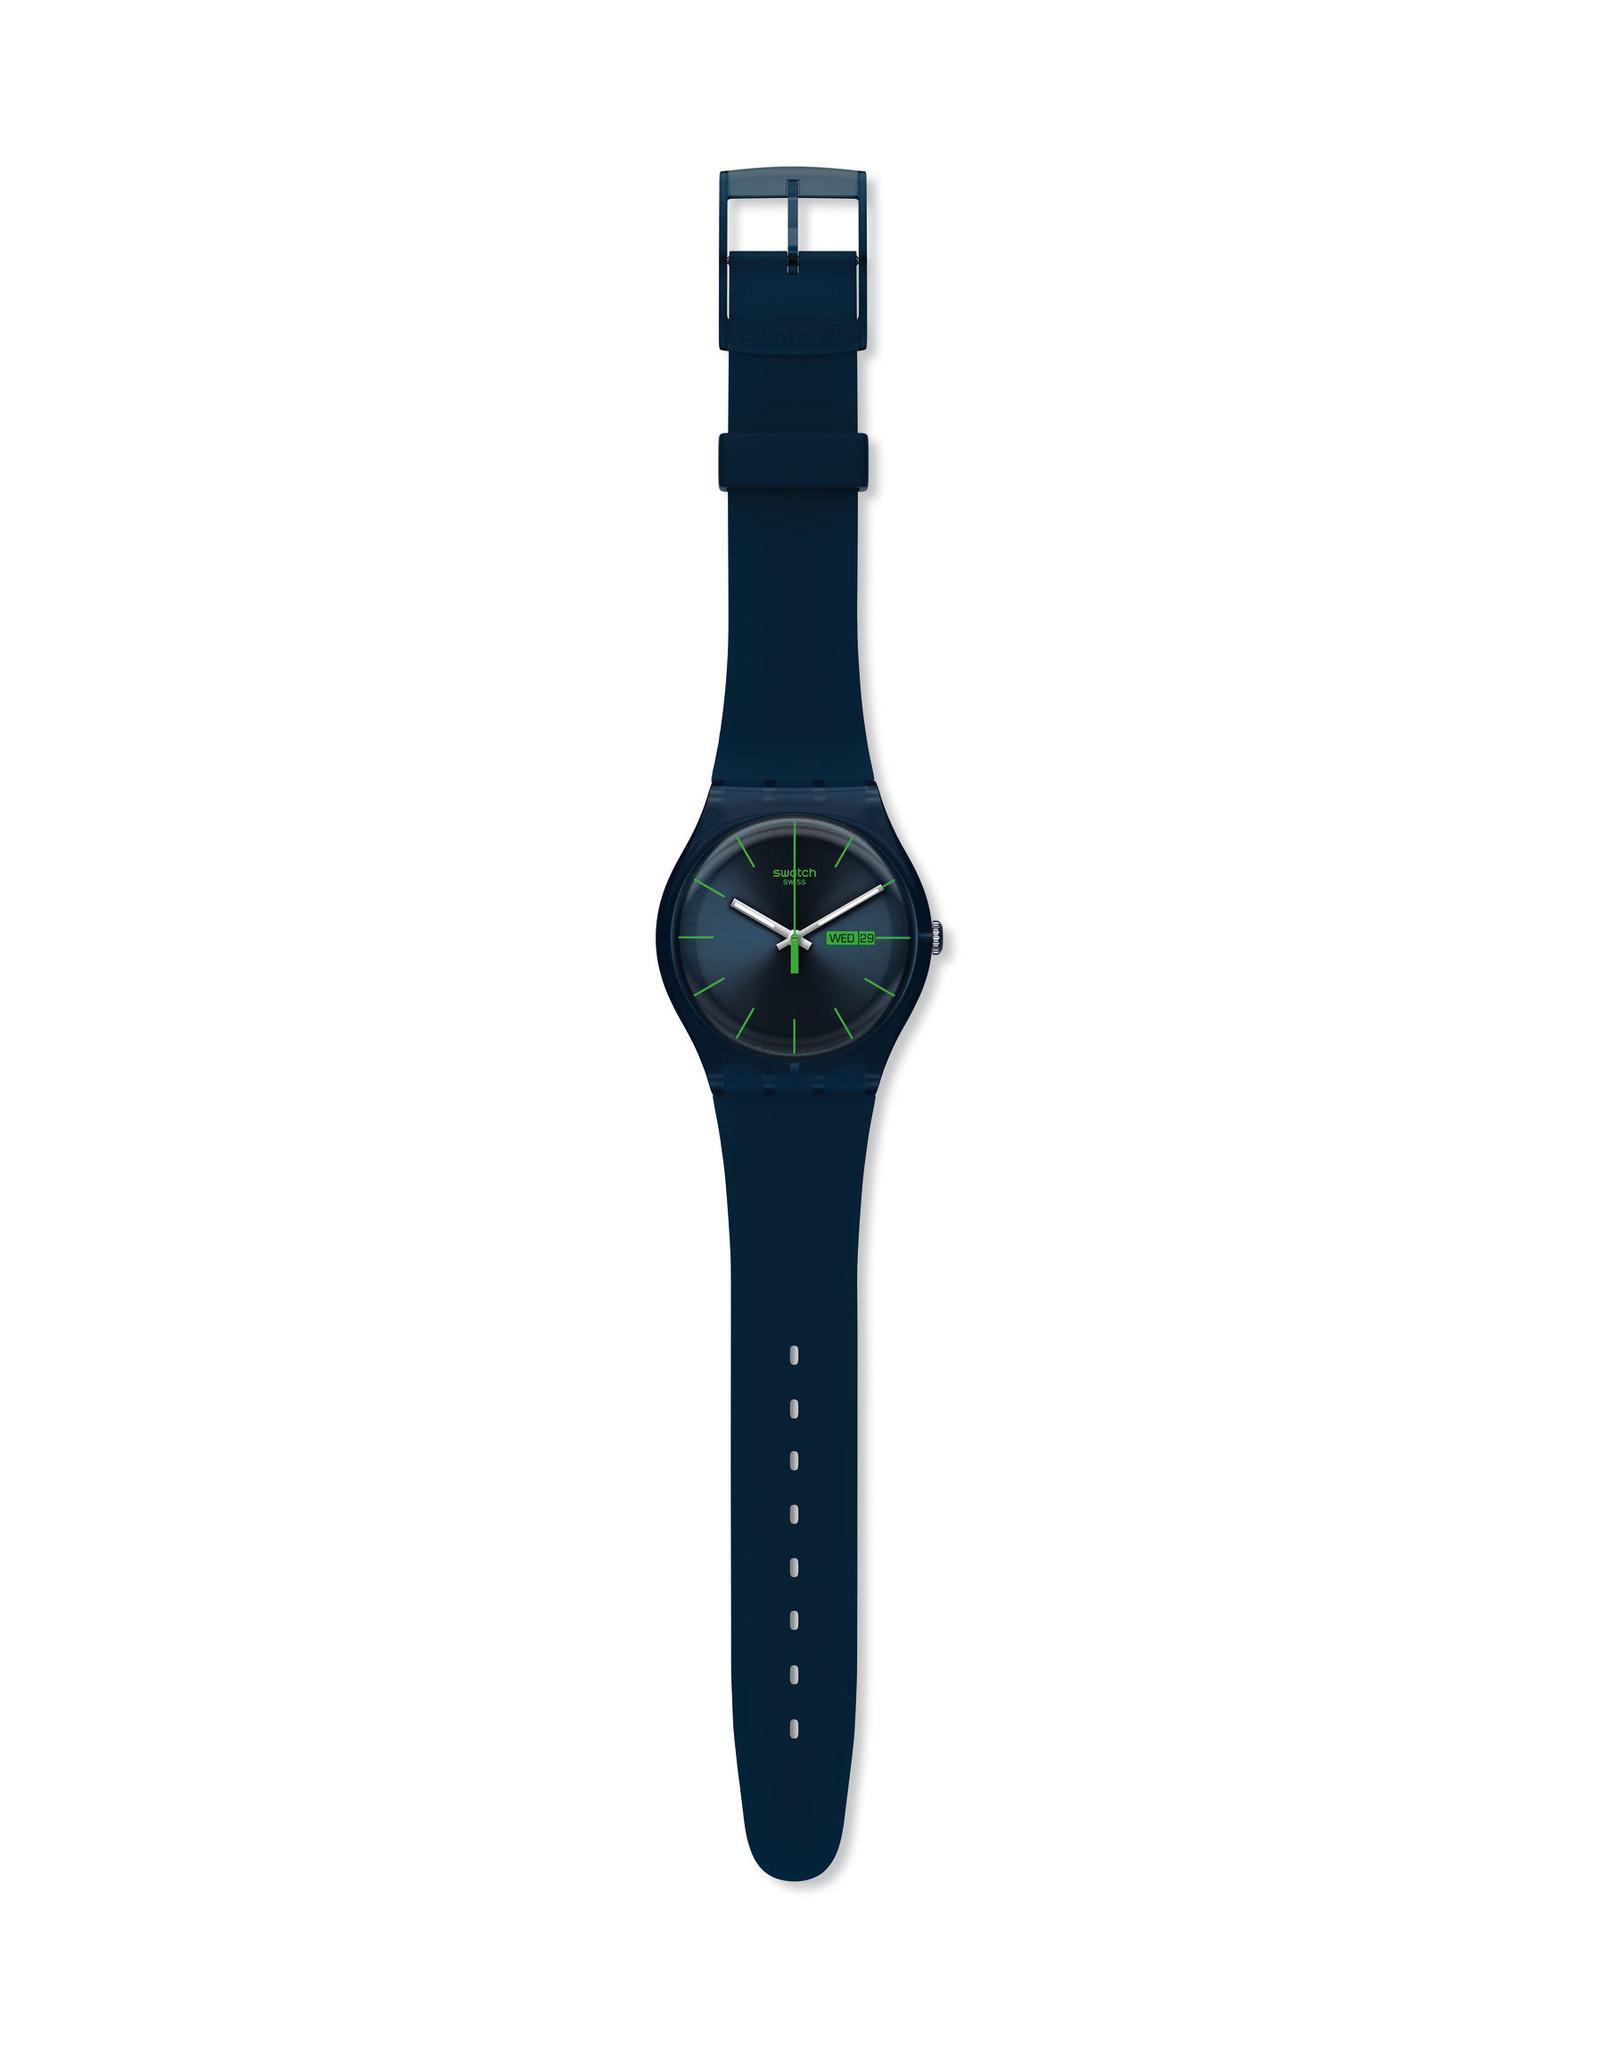 Swatch Swatch SUON700 BLUE REBEL